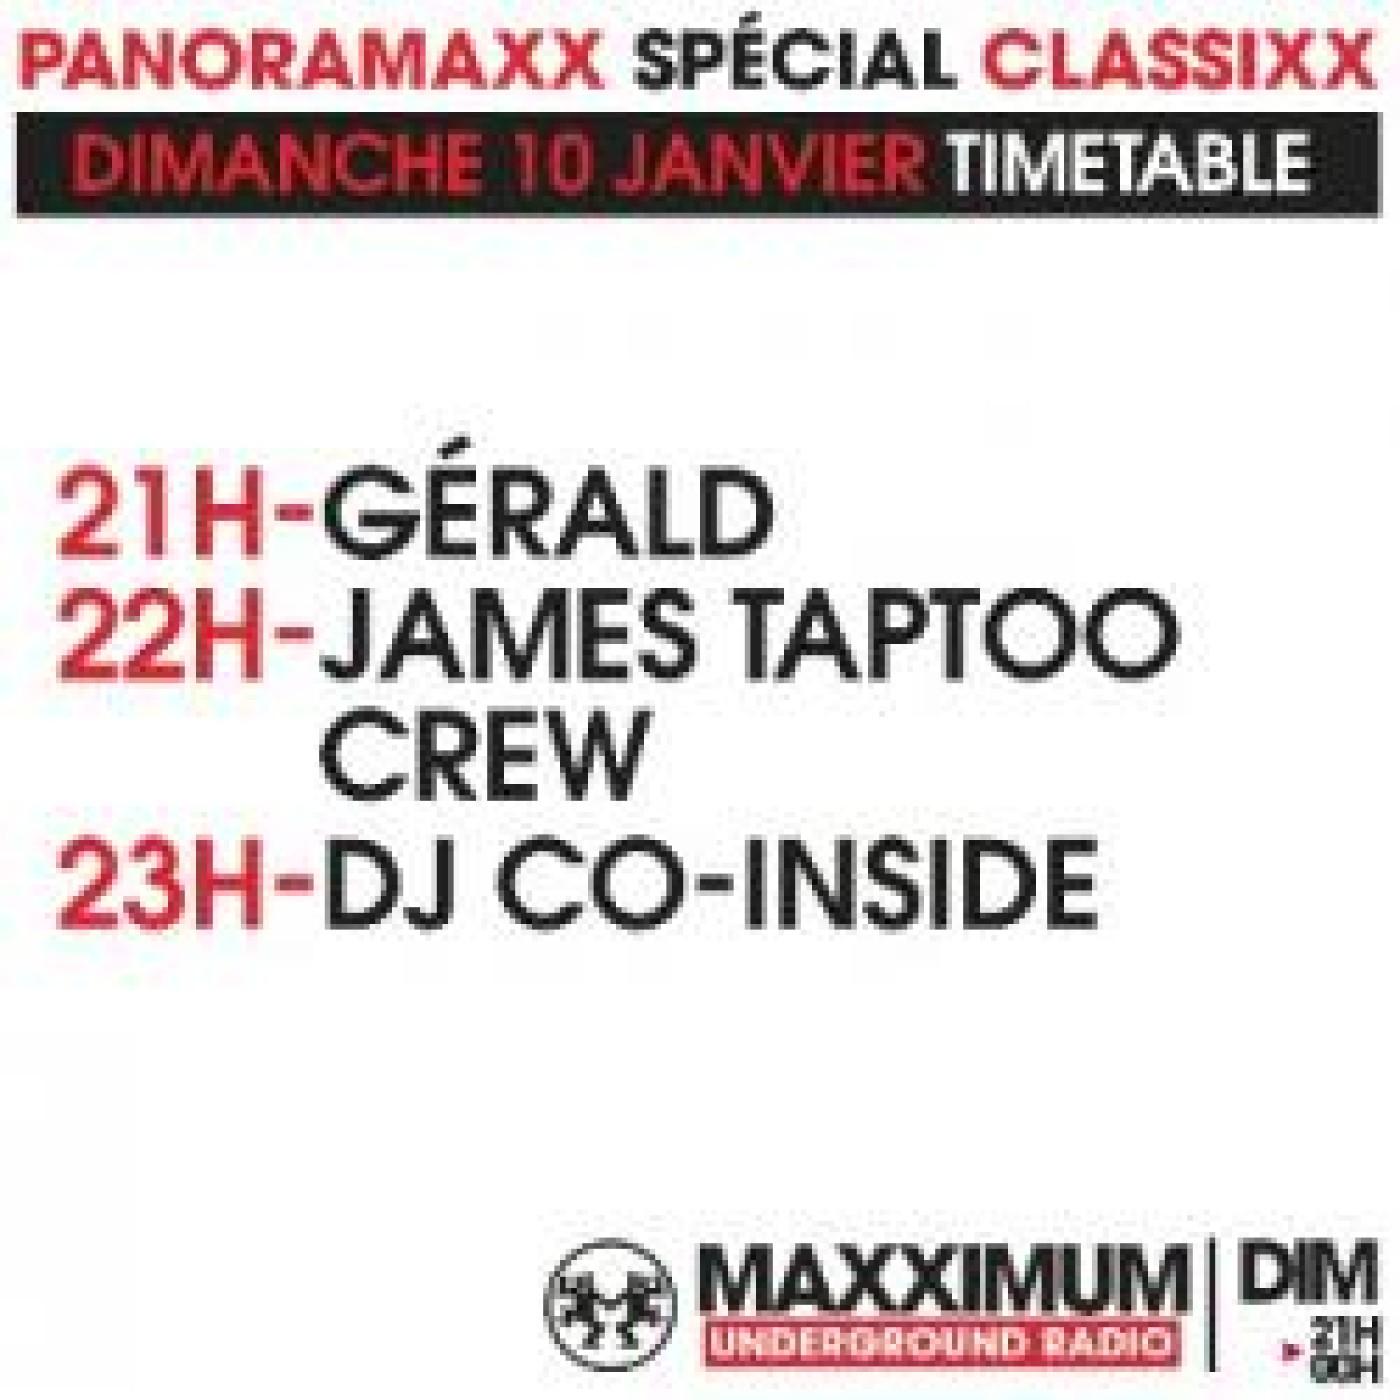 PANORAMAXX 90'S : JAMES TAPTOO CREW